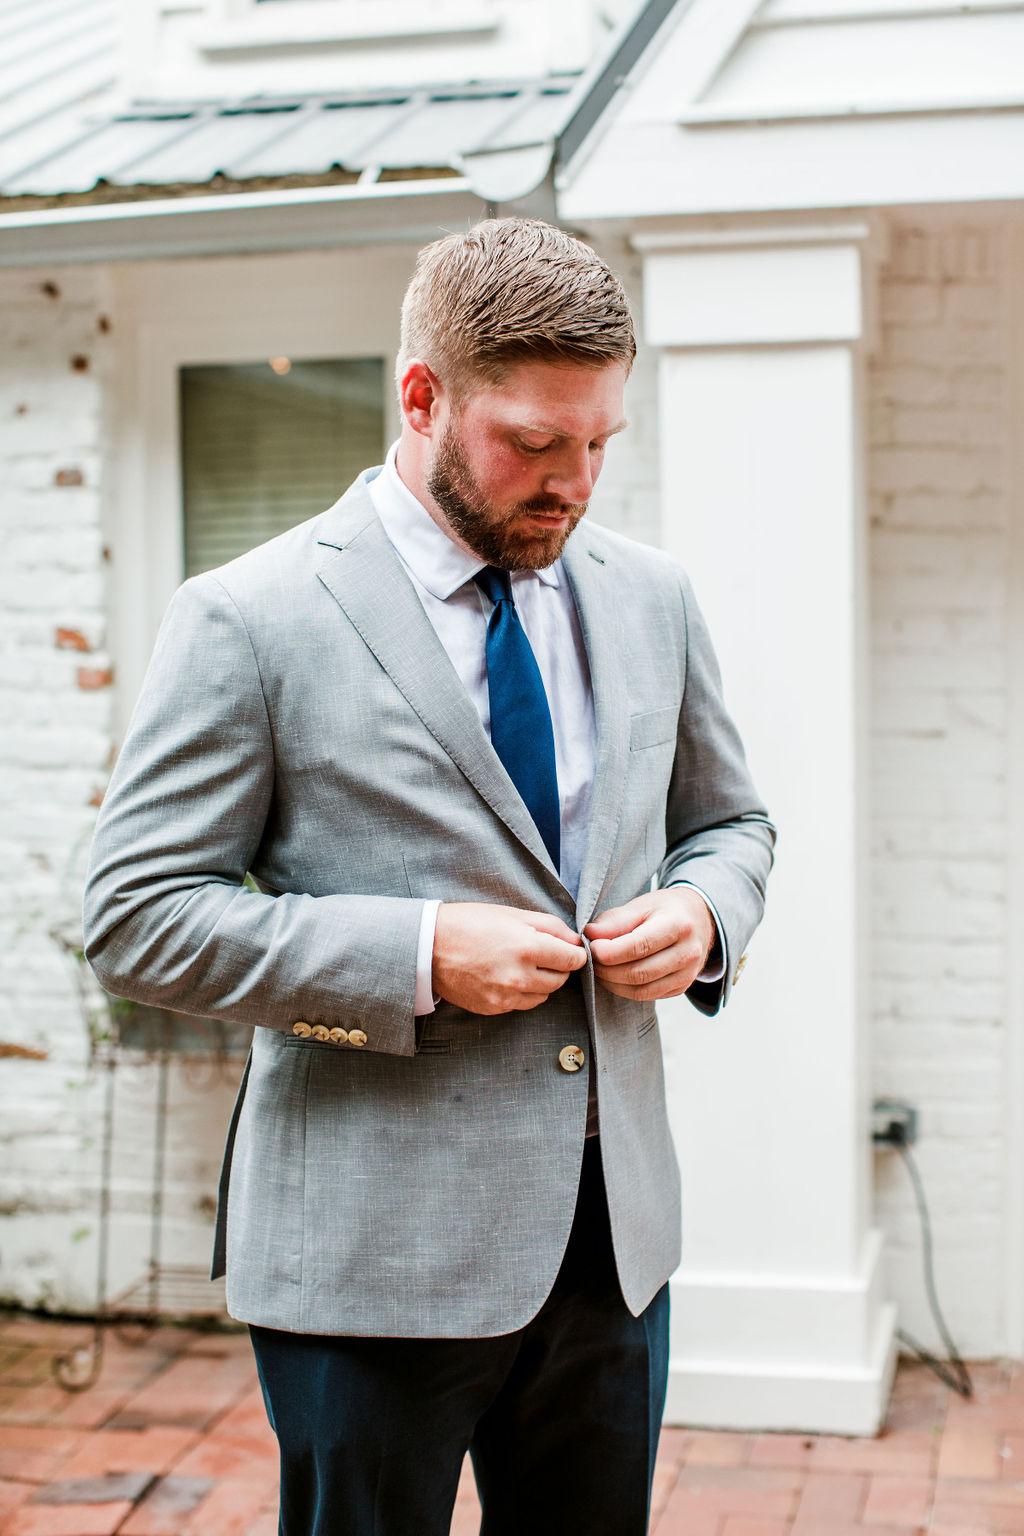 Gray Indochino tuxedo jacket with blue tie | Nashville Bride Guide